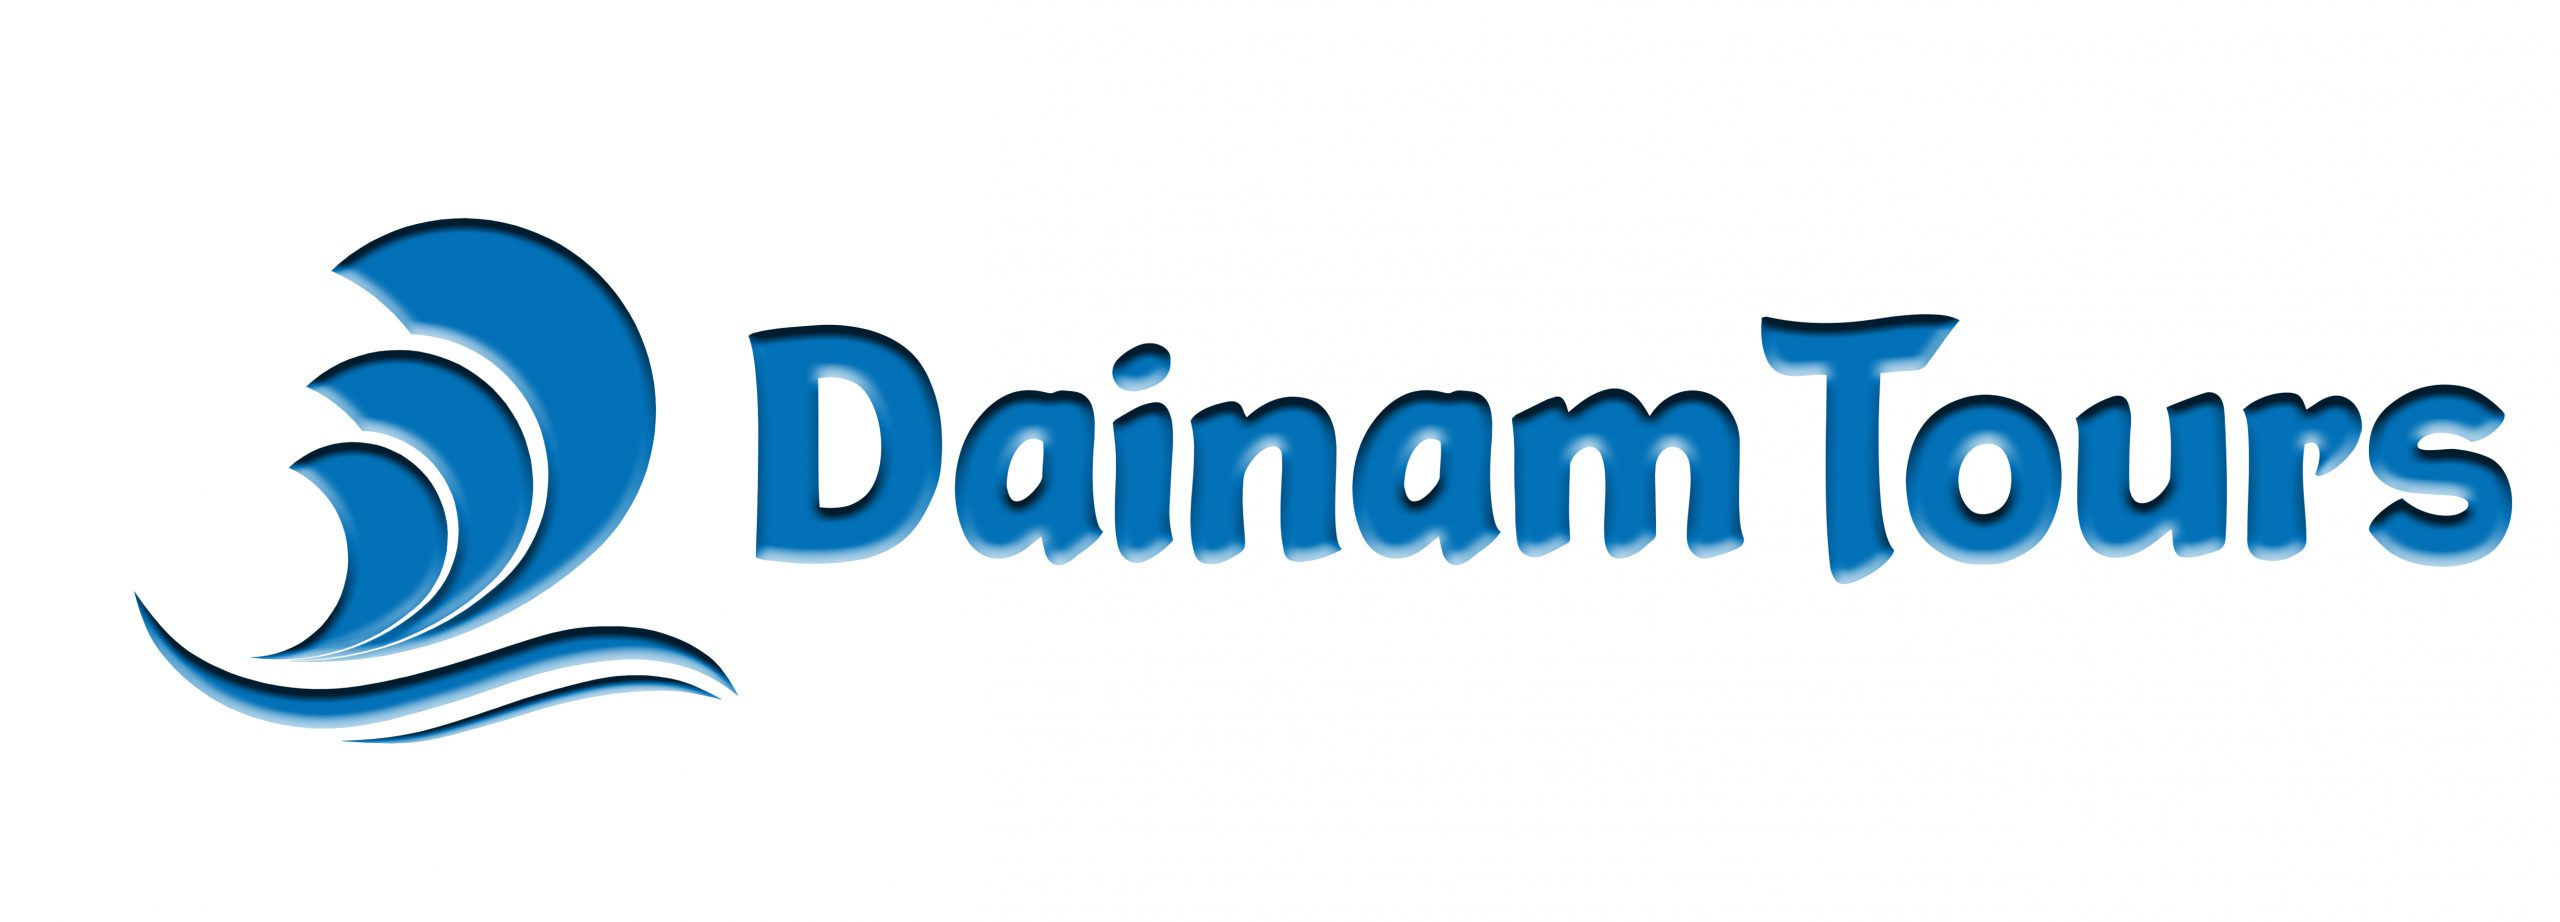 dainamtour